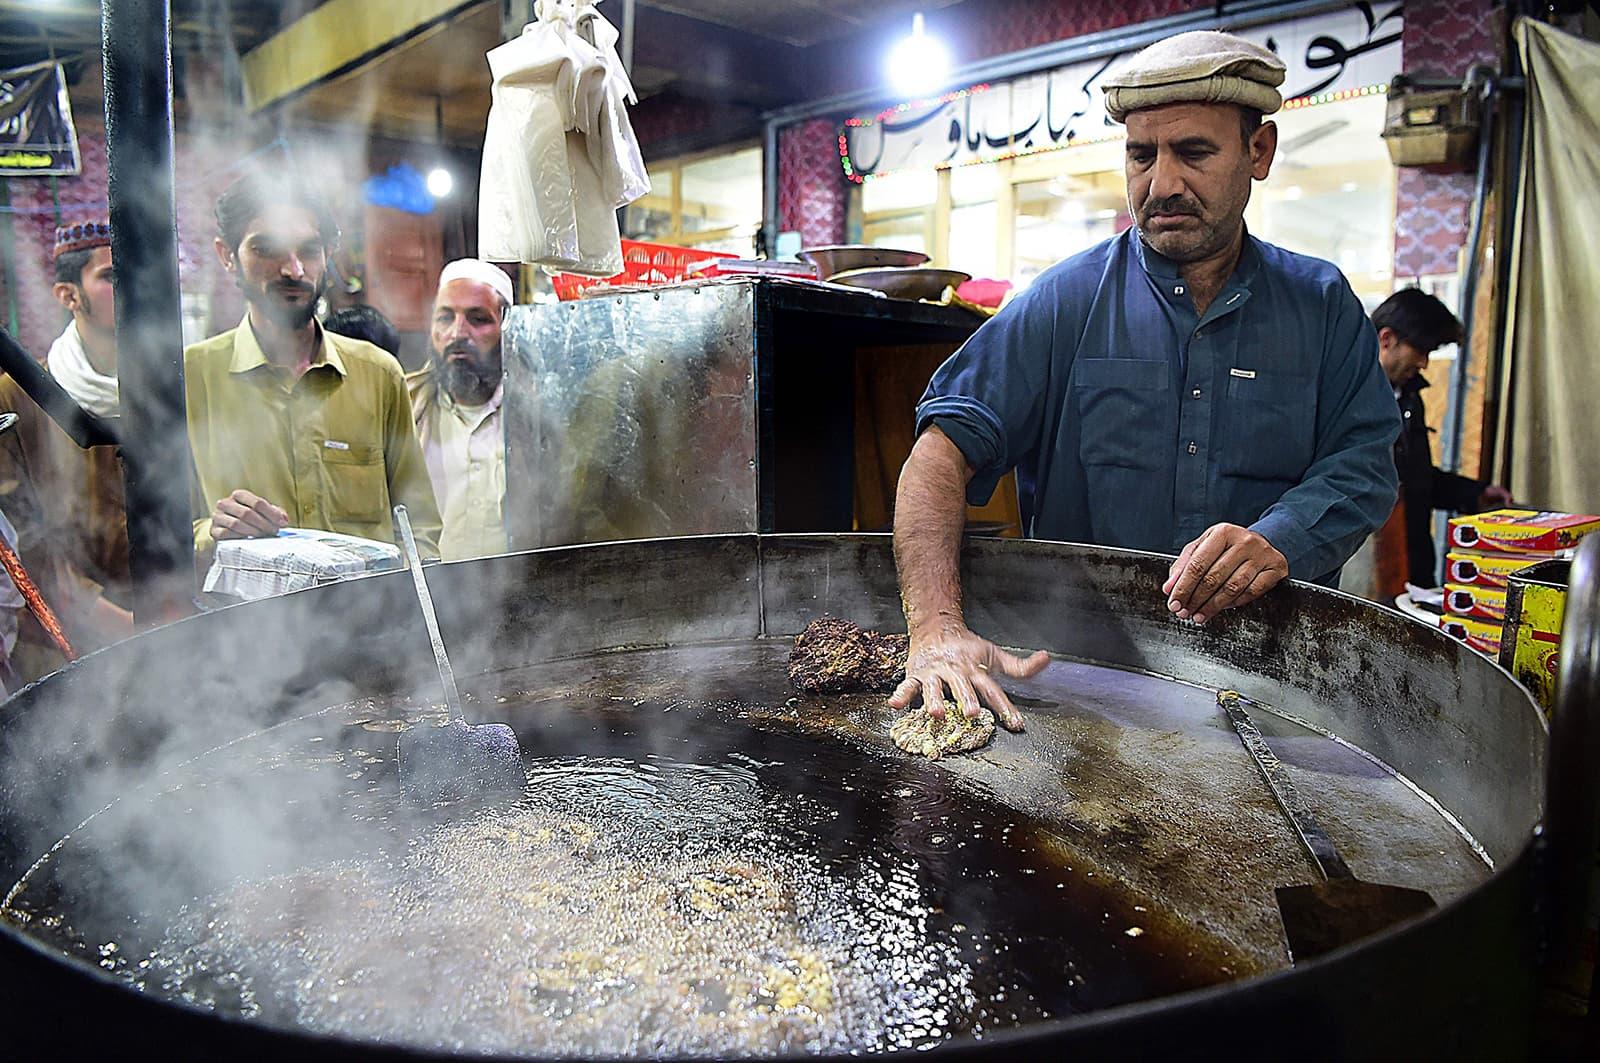 A cook fries kebabs as customers gather around at the Tory Kebab House in Namak Mandi in Peshawar. — AFP